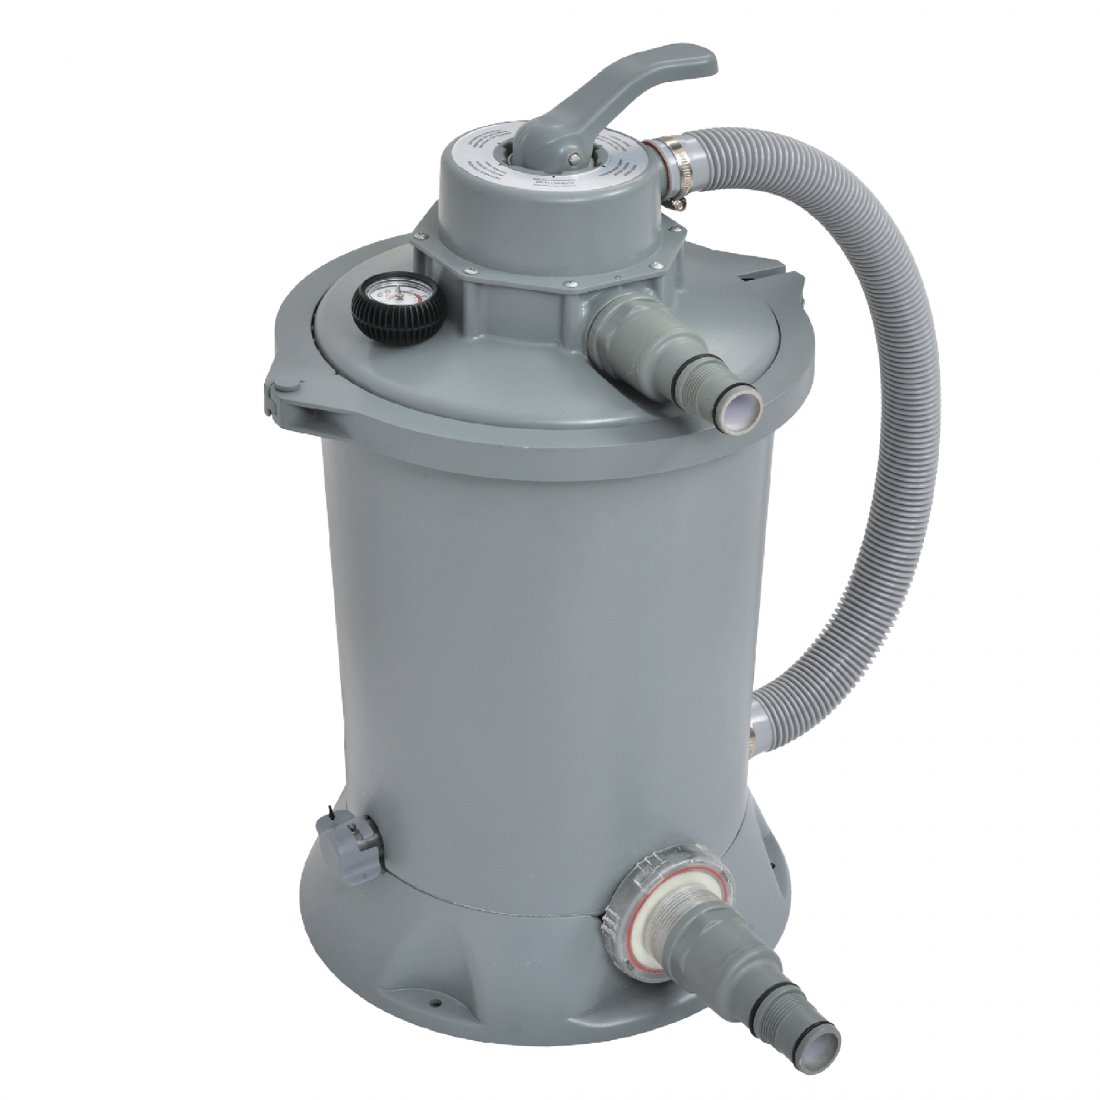 Buy jilong sand filter pump 800 pool sand filter pump for Pool filterpumpe obi